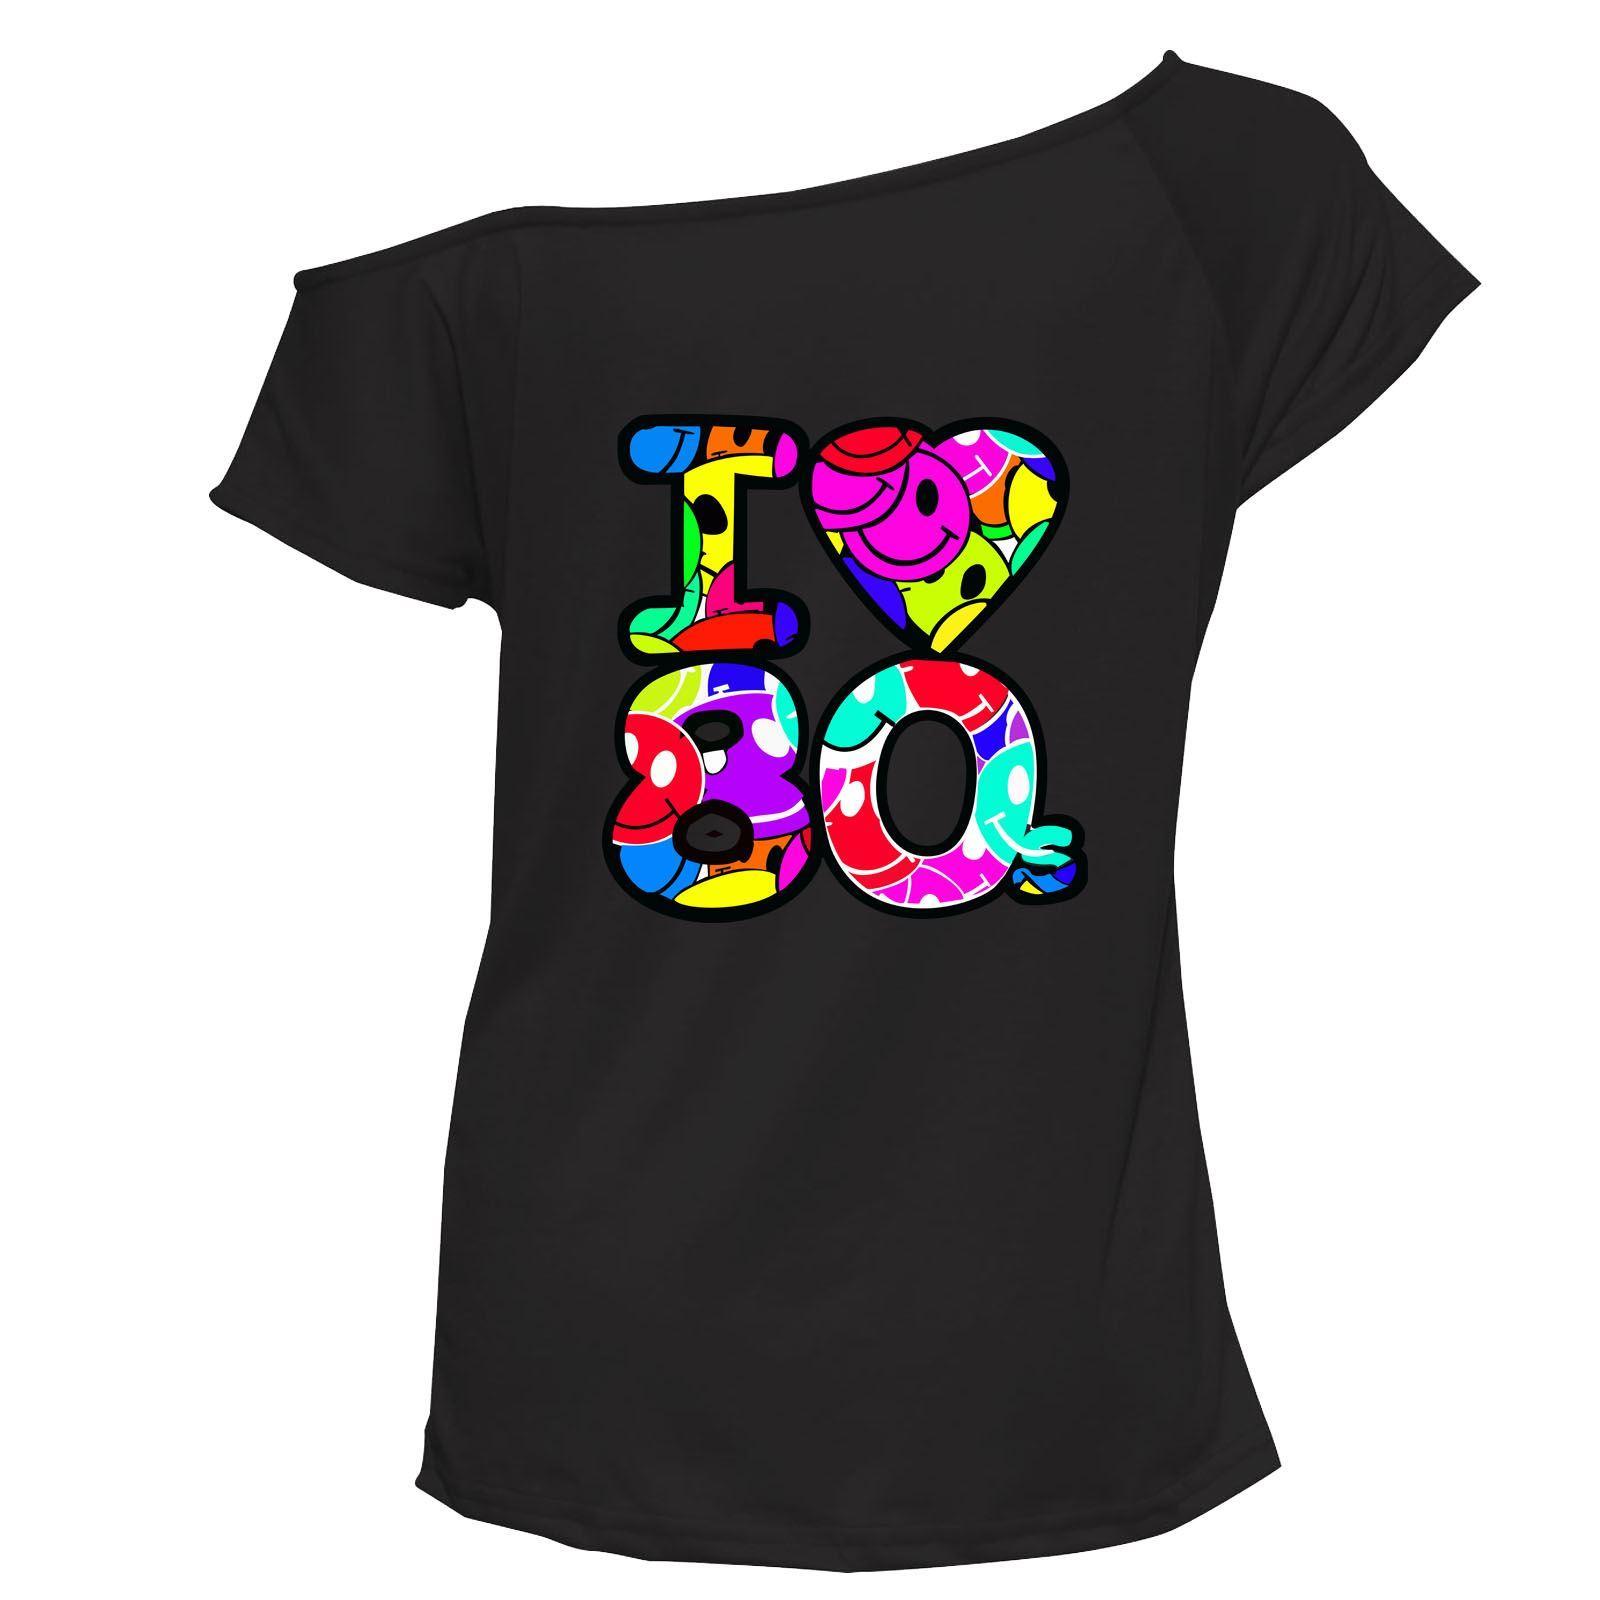 Womens I Love The 80s Print TShirt Ladies Off Shoulder Top Tee Lot 6014792 ®